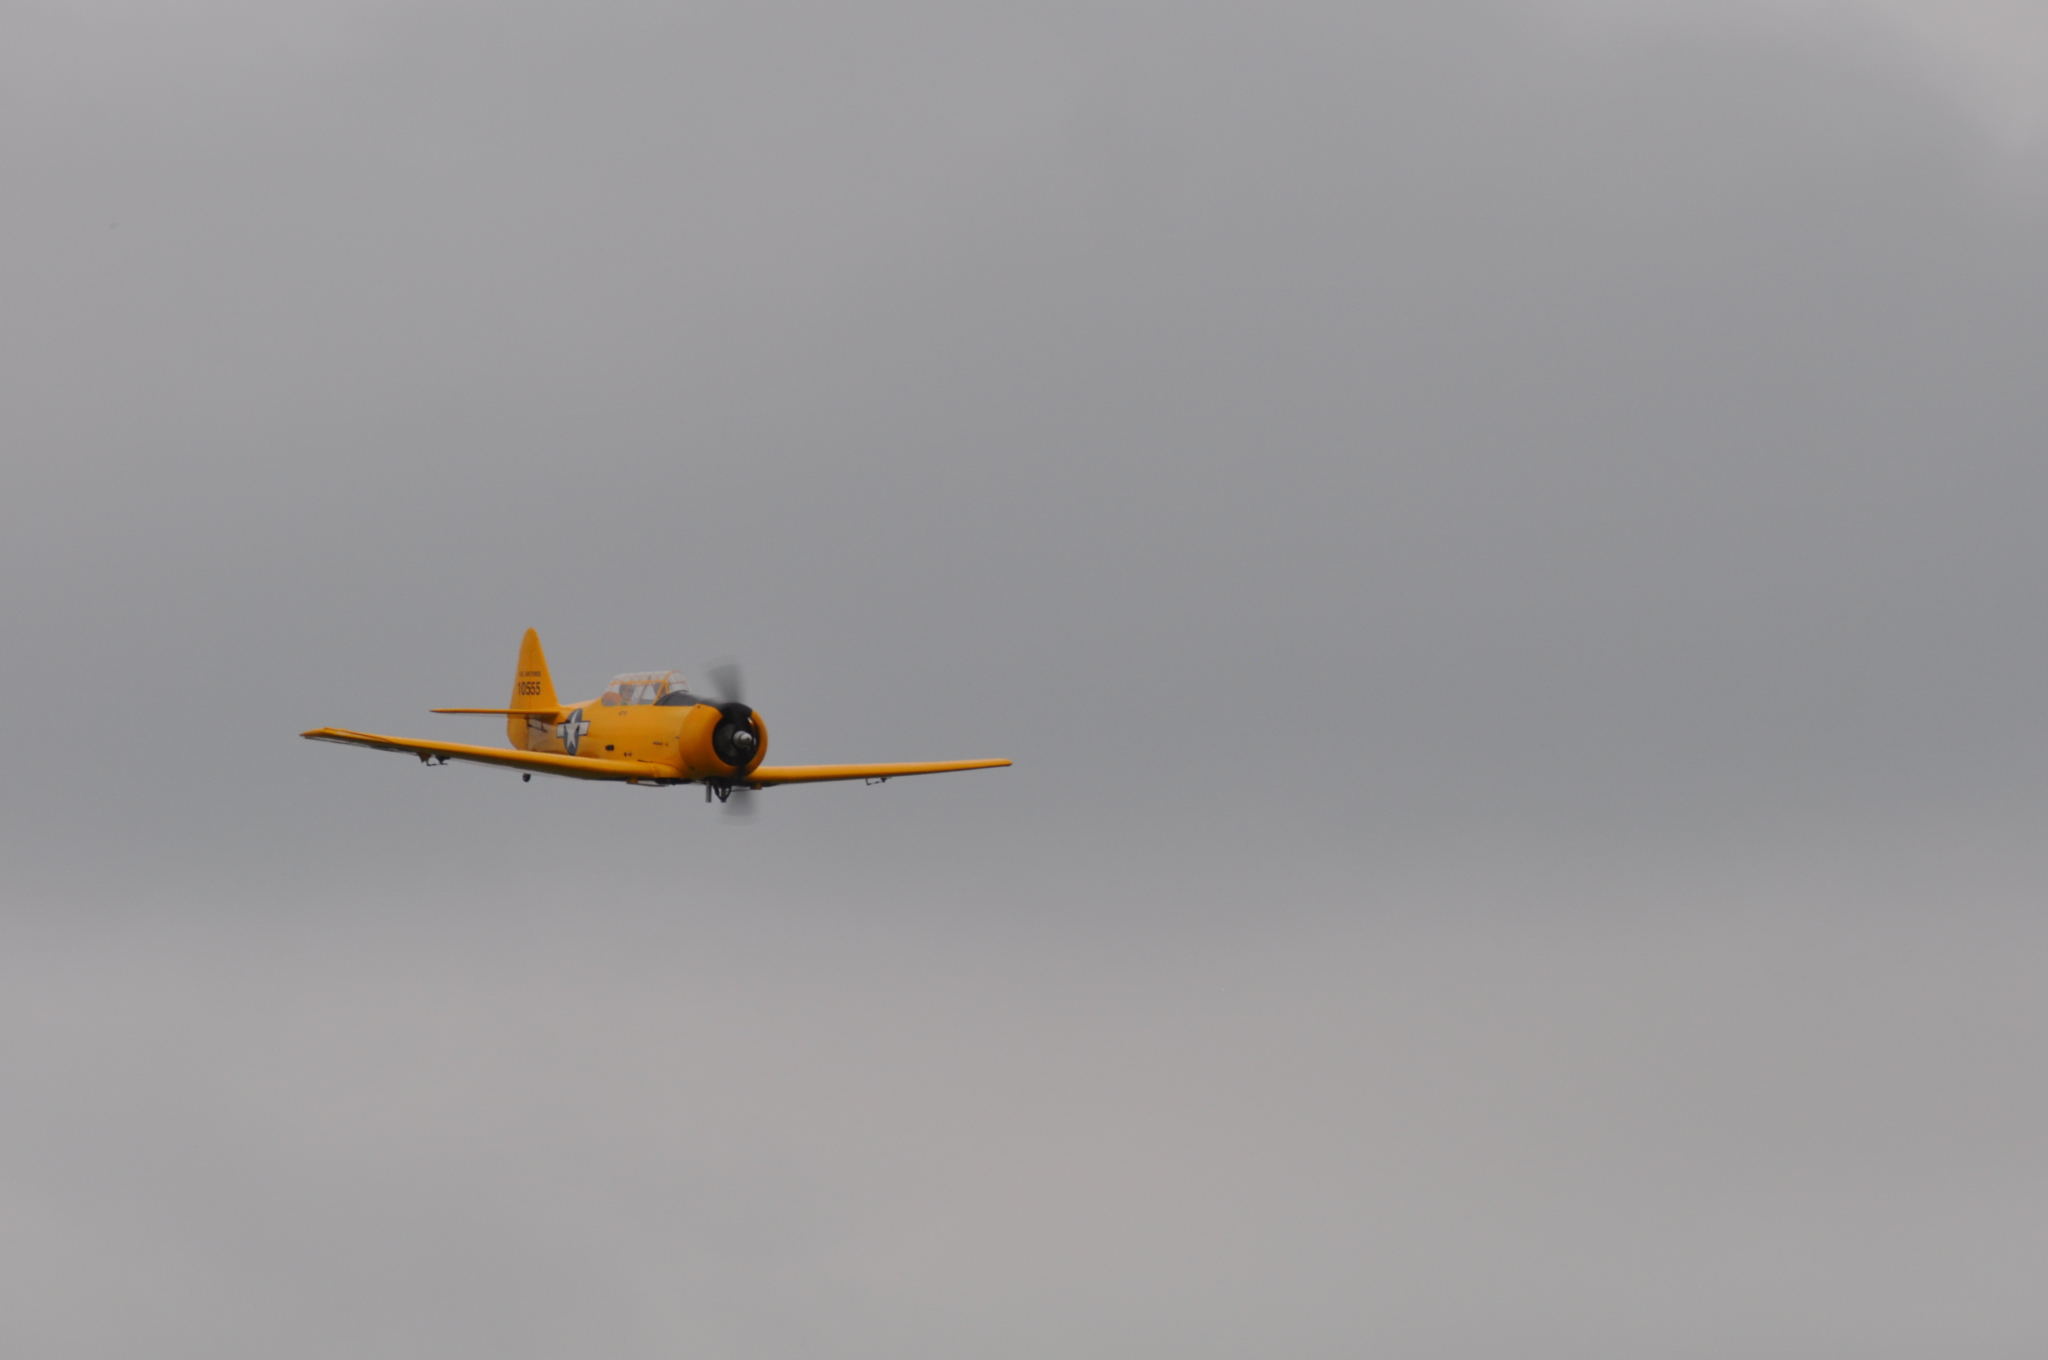 DSC_8961.JPG